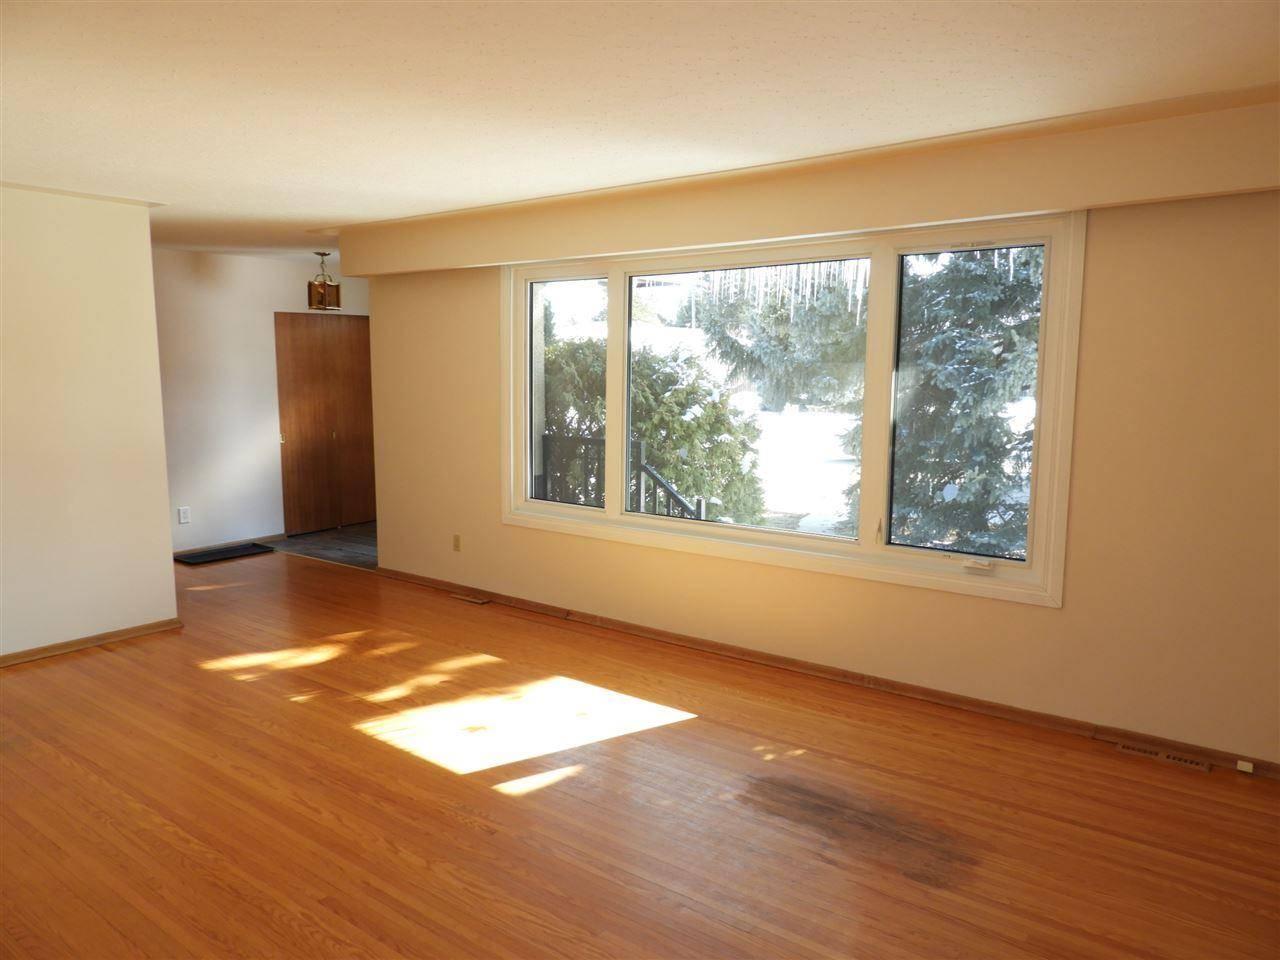 14424 80 Avenue Nw, Edmonton | Image 2